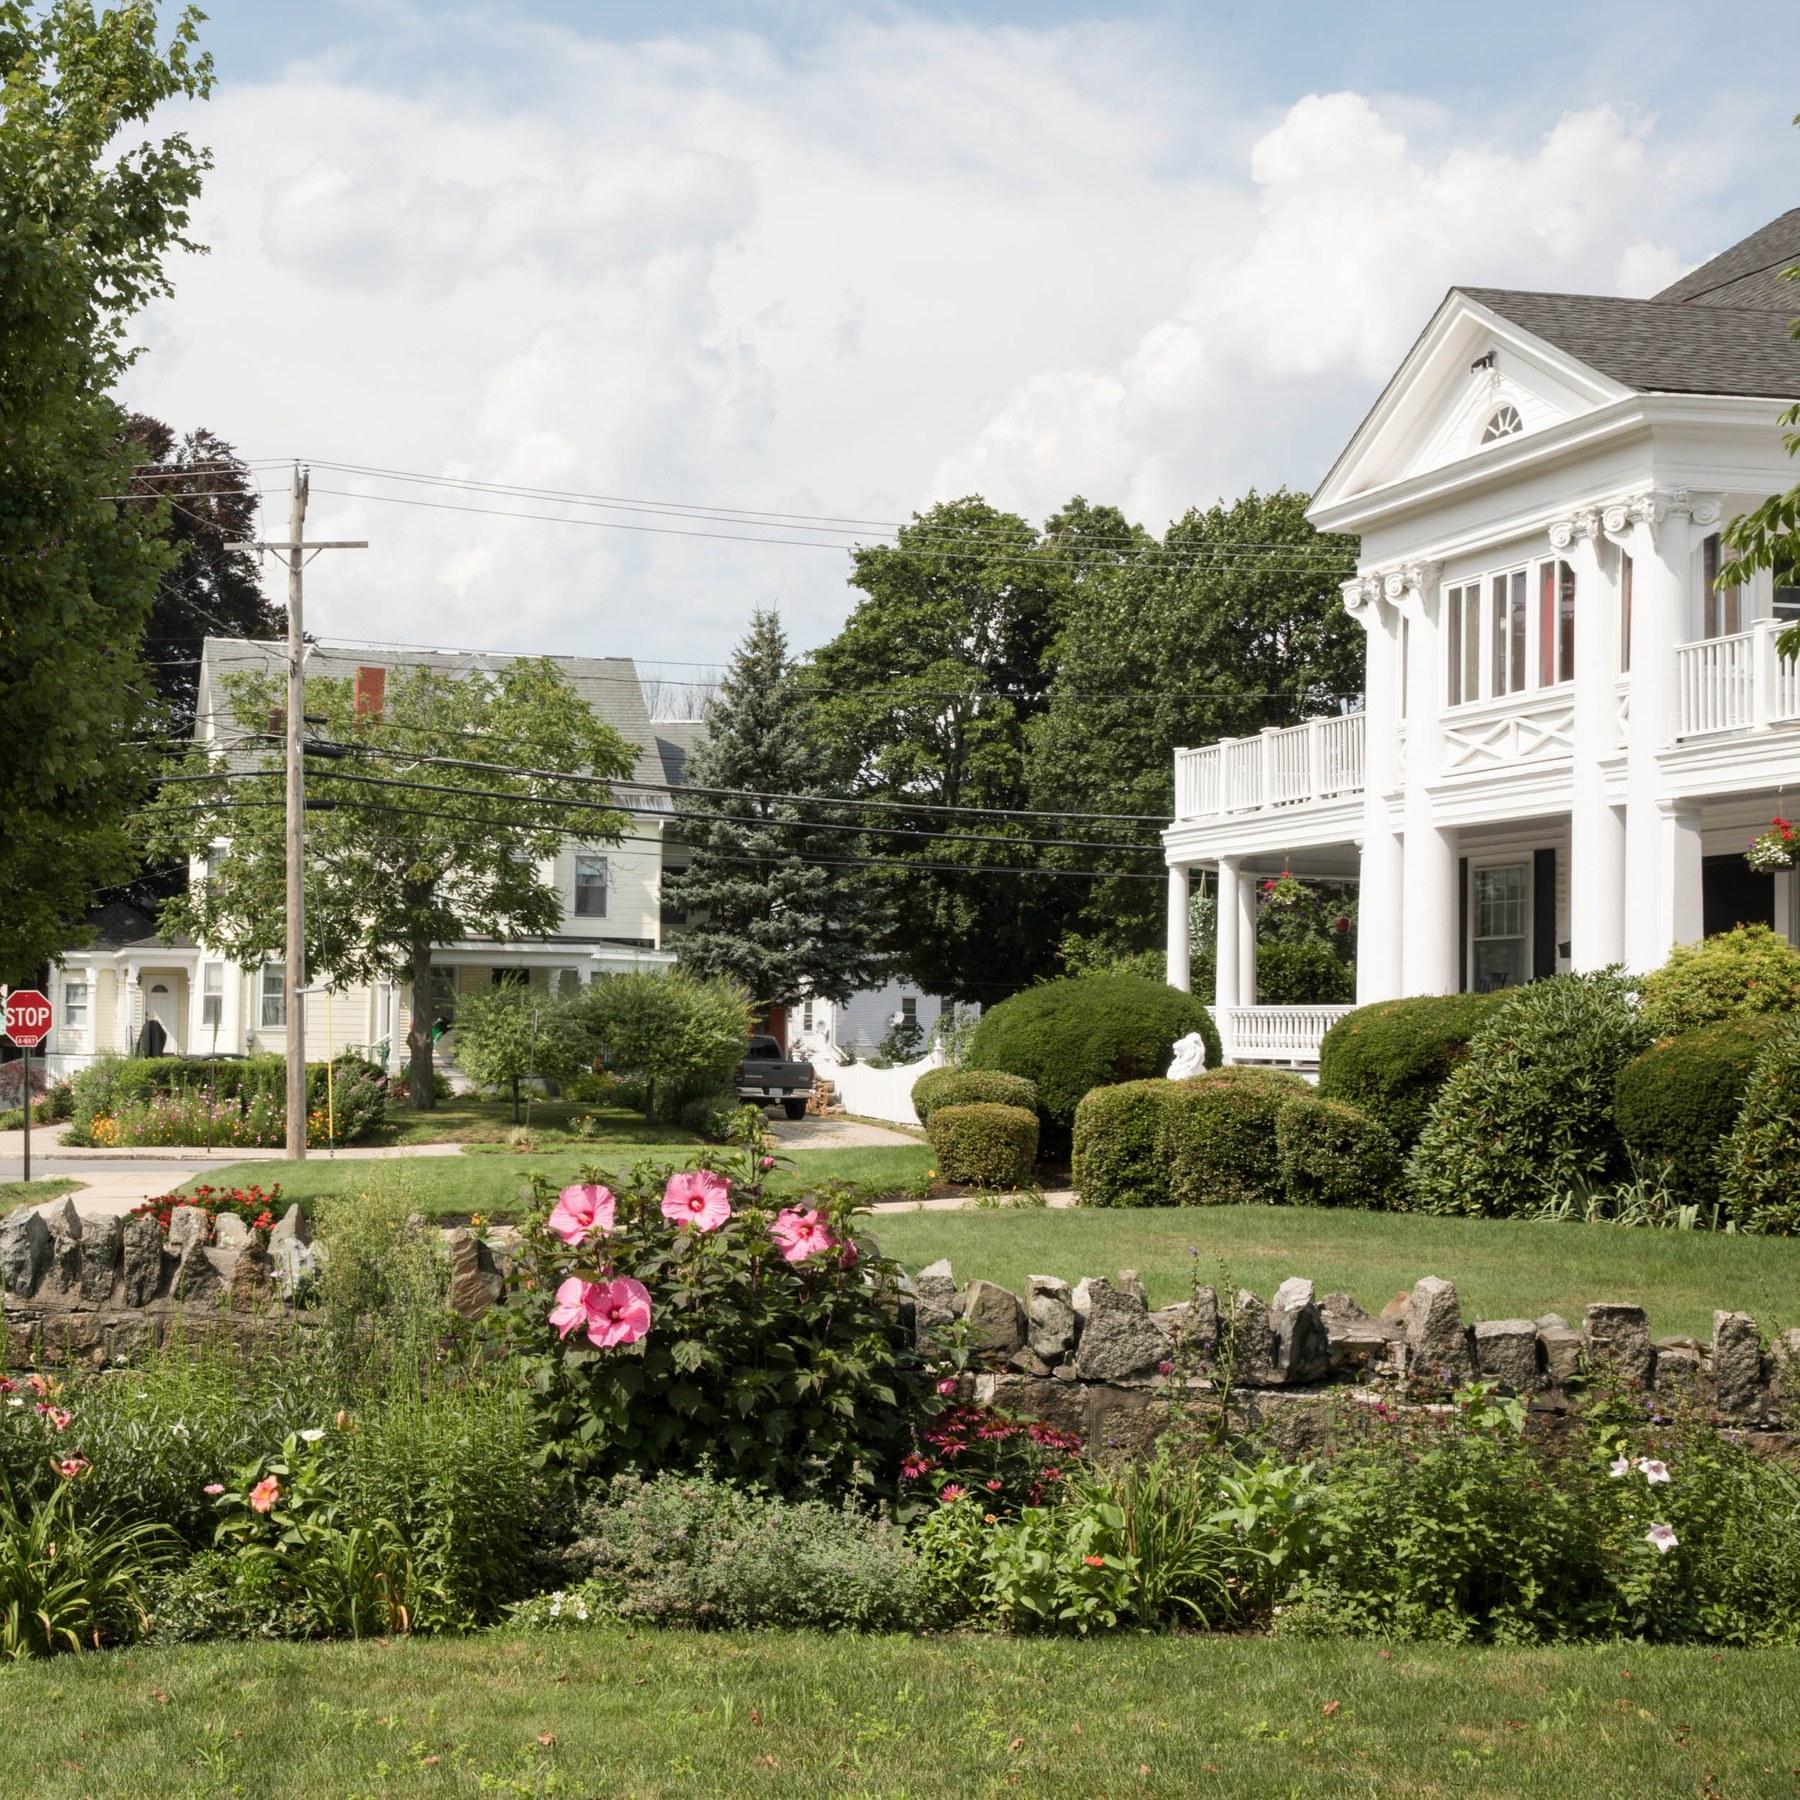 Melrose Ma Apartments: East Side, Melrose MA - Neighborhood Guide